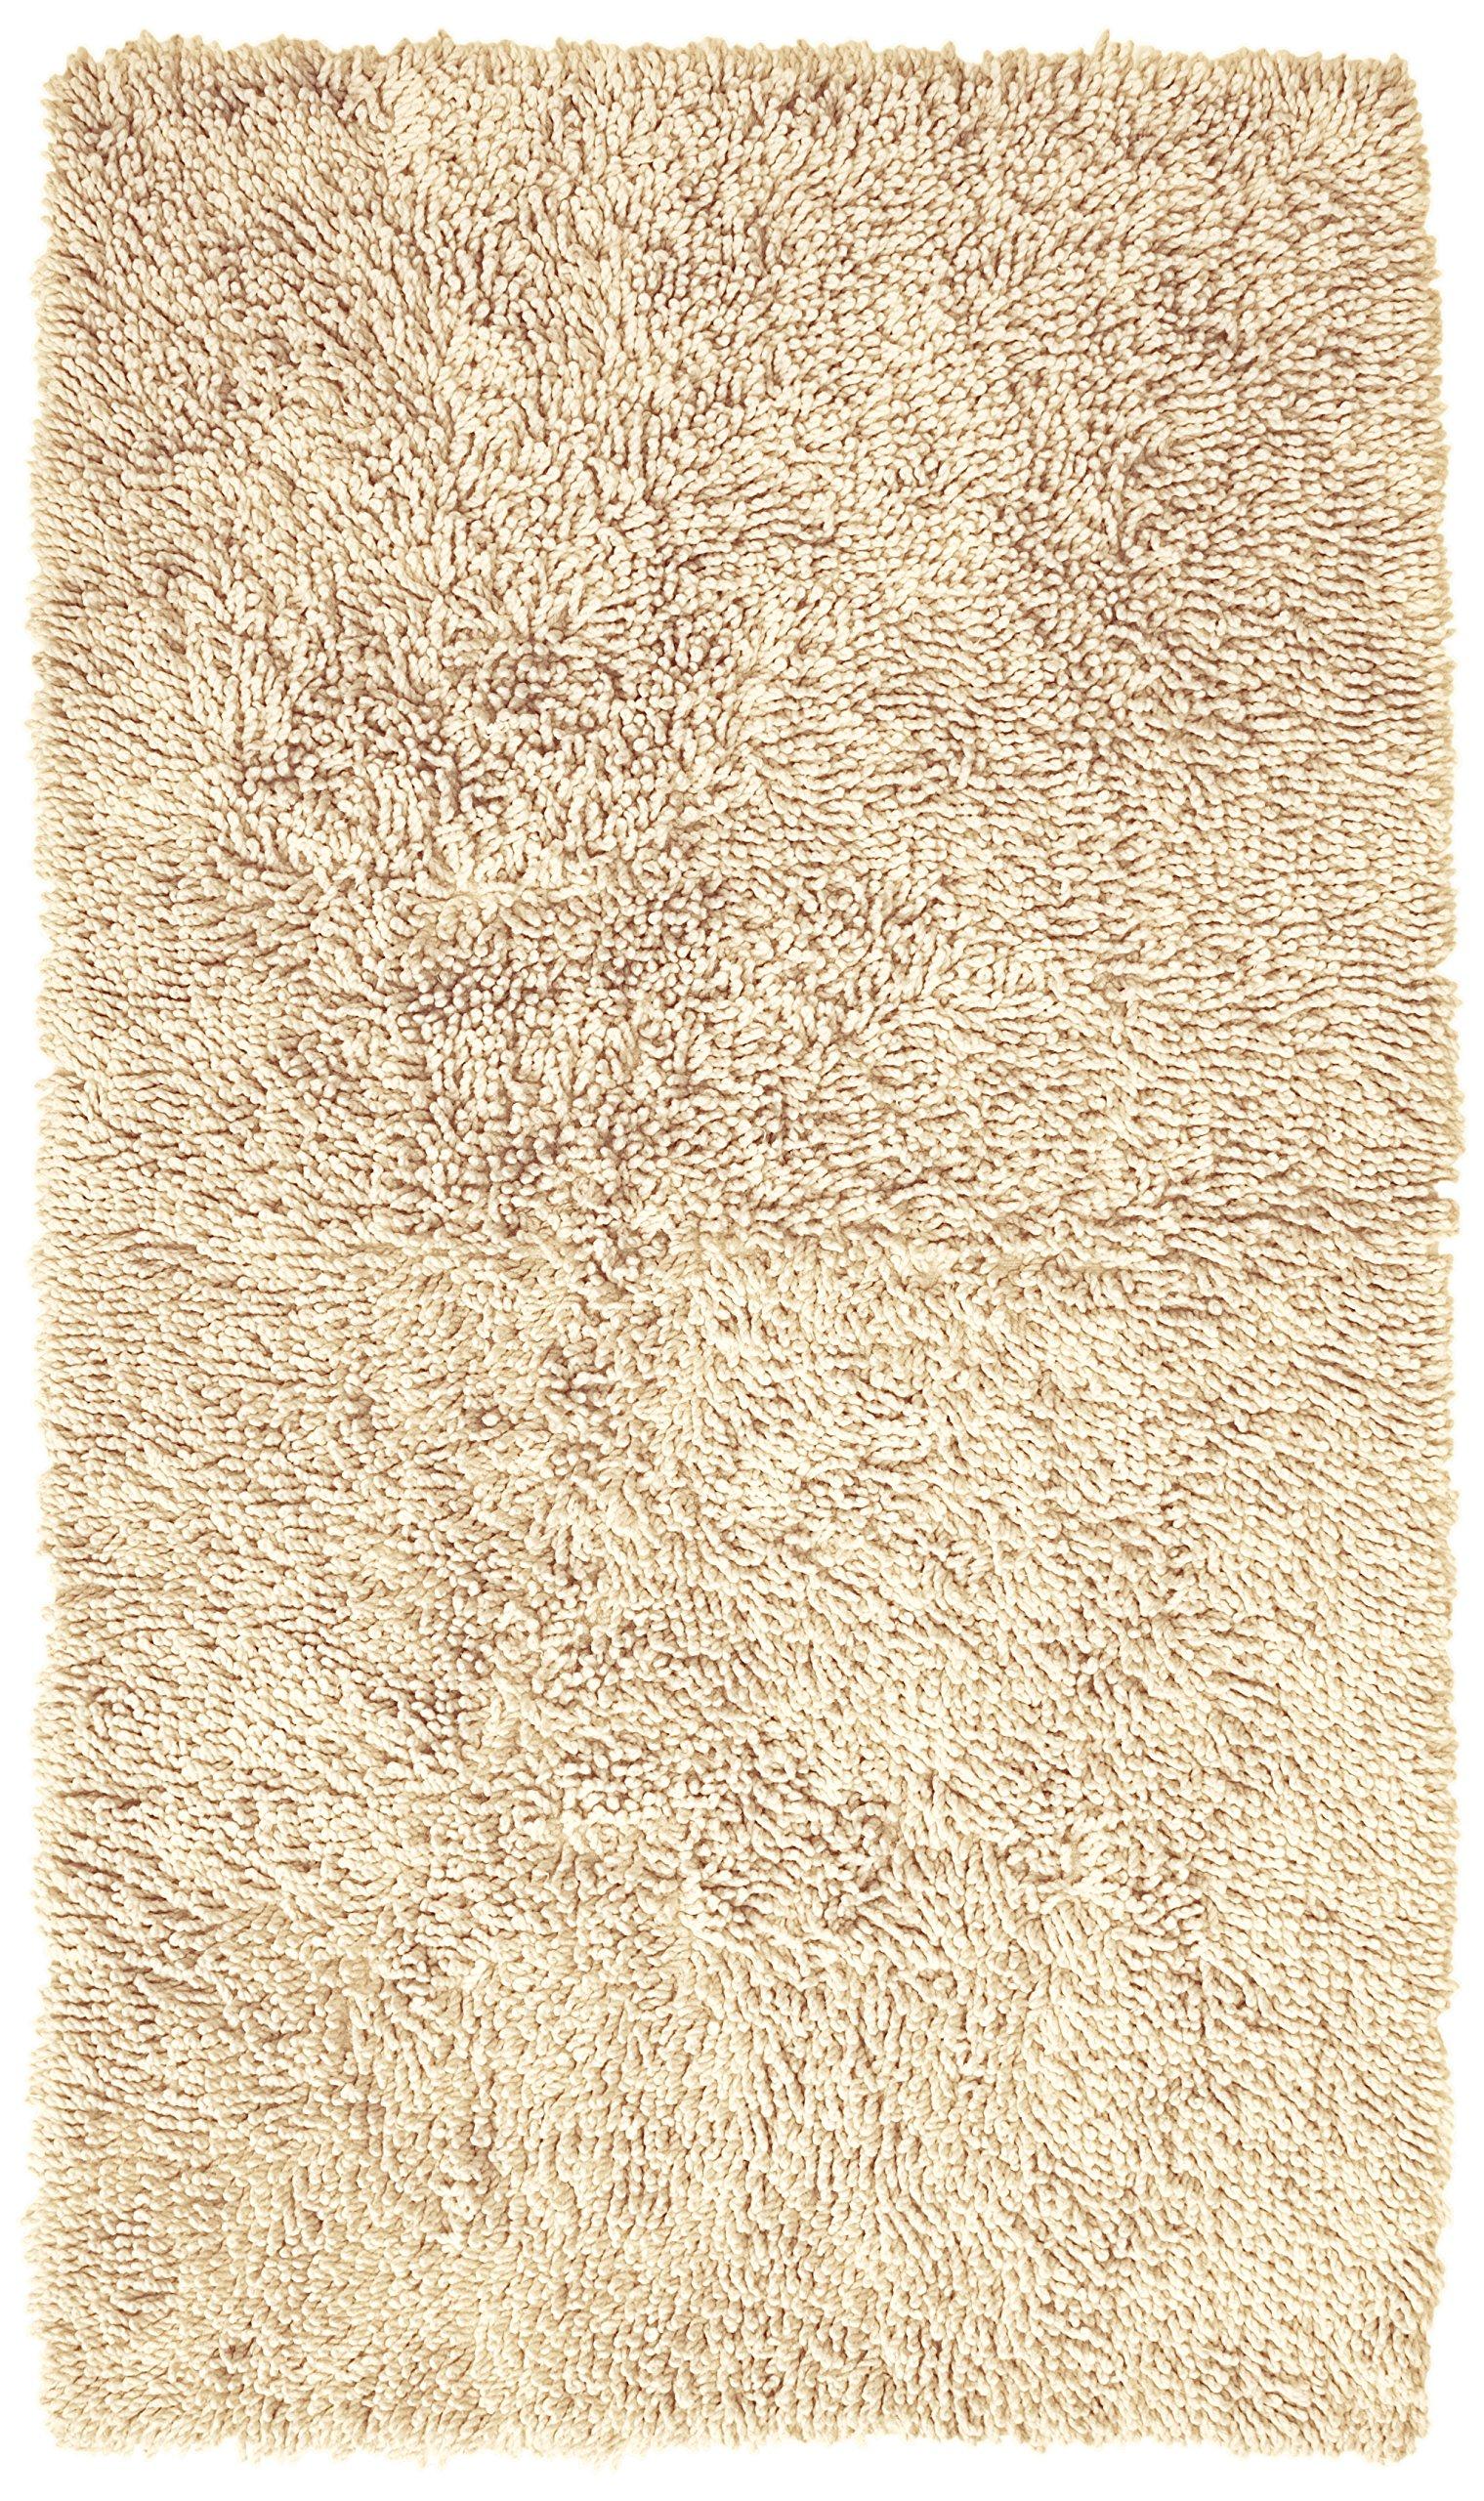 Pinzon Non-Slip Cotton Looped Bathroom Rug - 30 x 50 Inch, Ivory